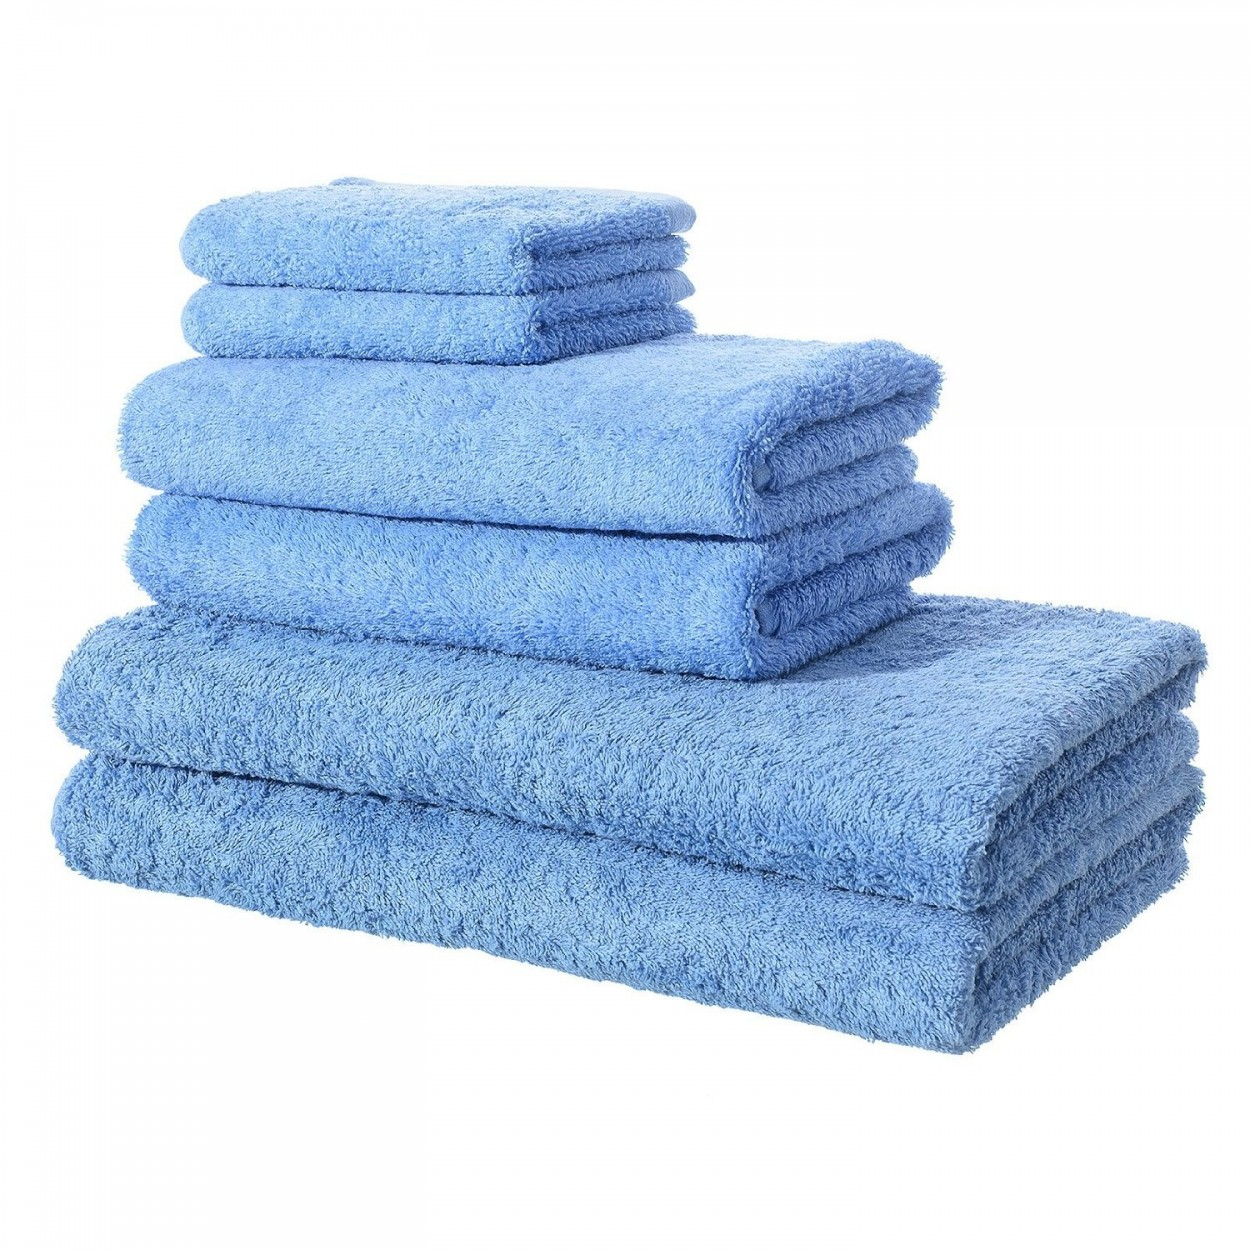 Toallas de ba o color azul hogar y m s - Toallas bano ...